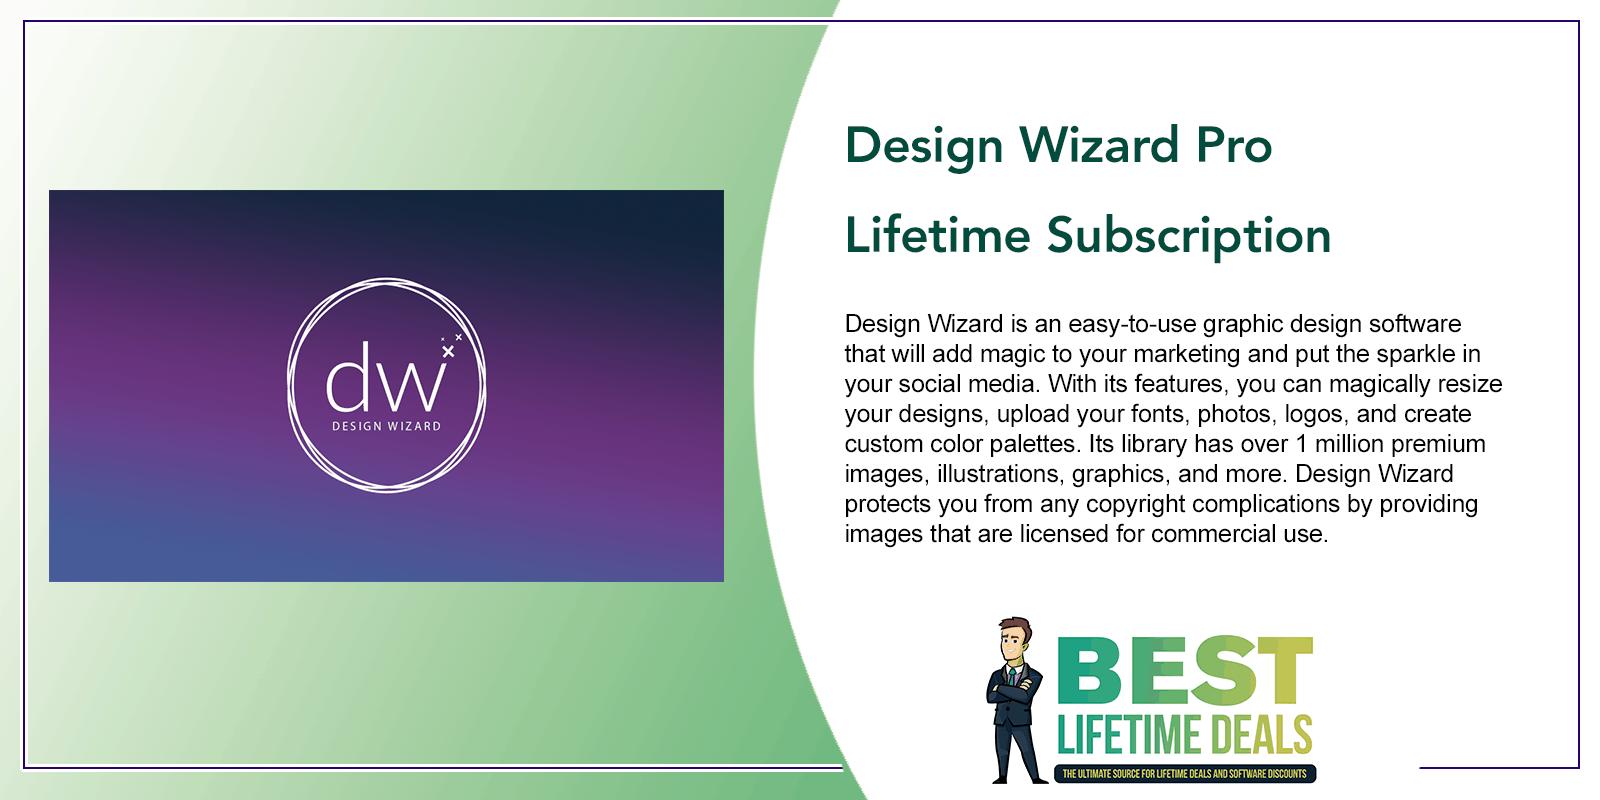 Design Wizard Pro Lifetime Subscription Post Image